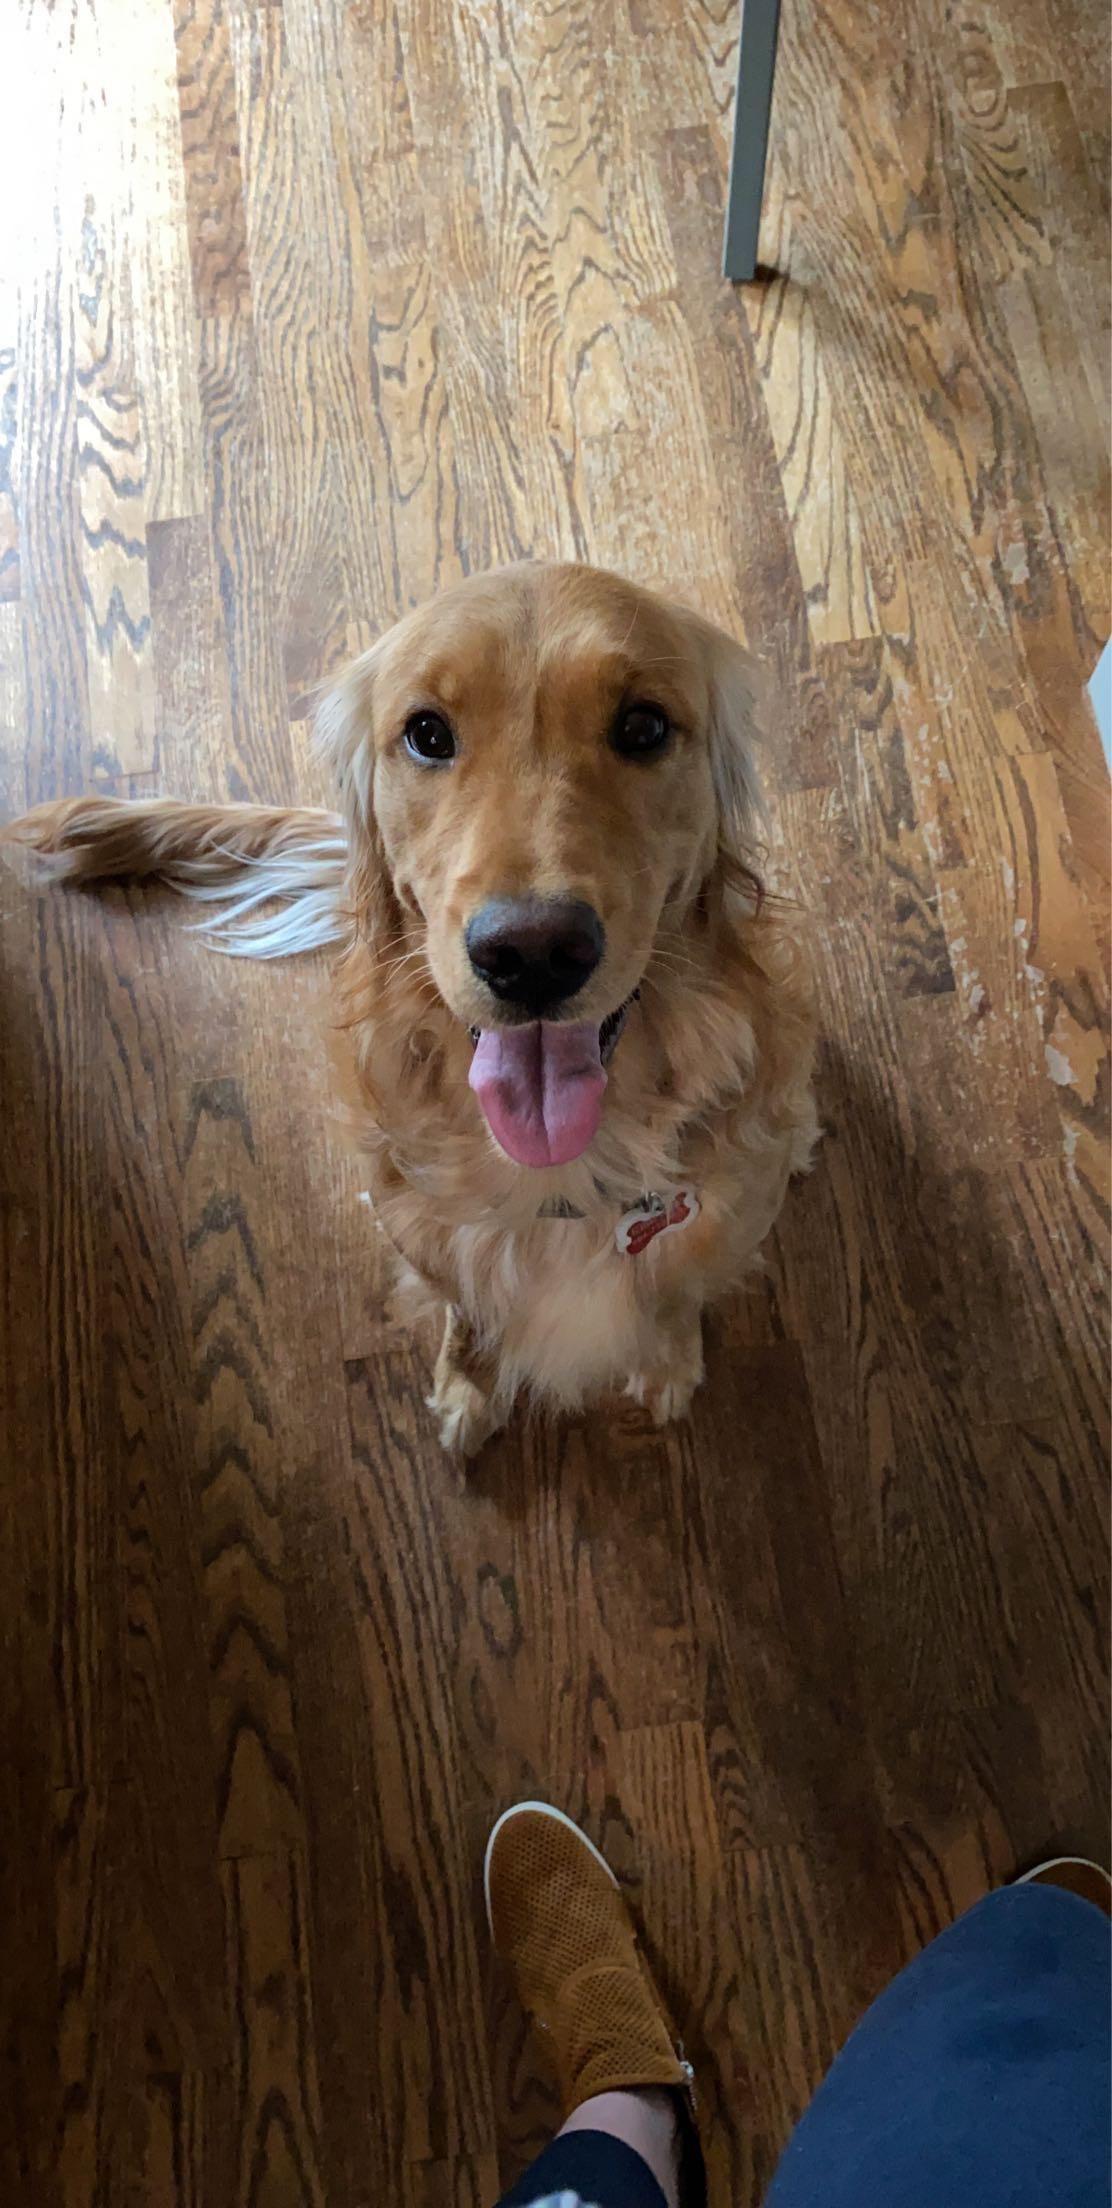 47 Adorable Golden Retriever Mix Breeds Doggypedia In 2020 Golden Retriever Dogs Golden Retriever Dogs And Puppies